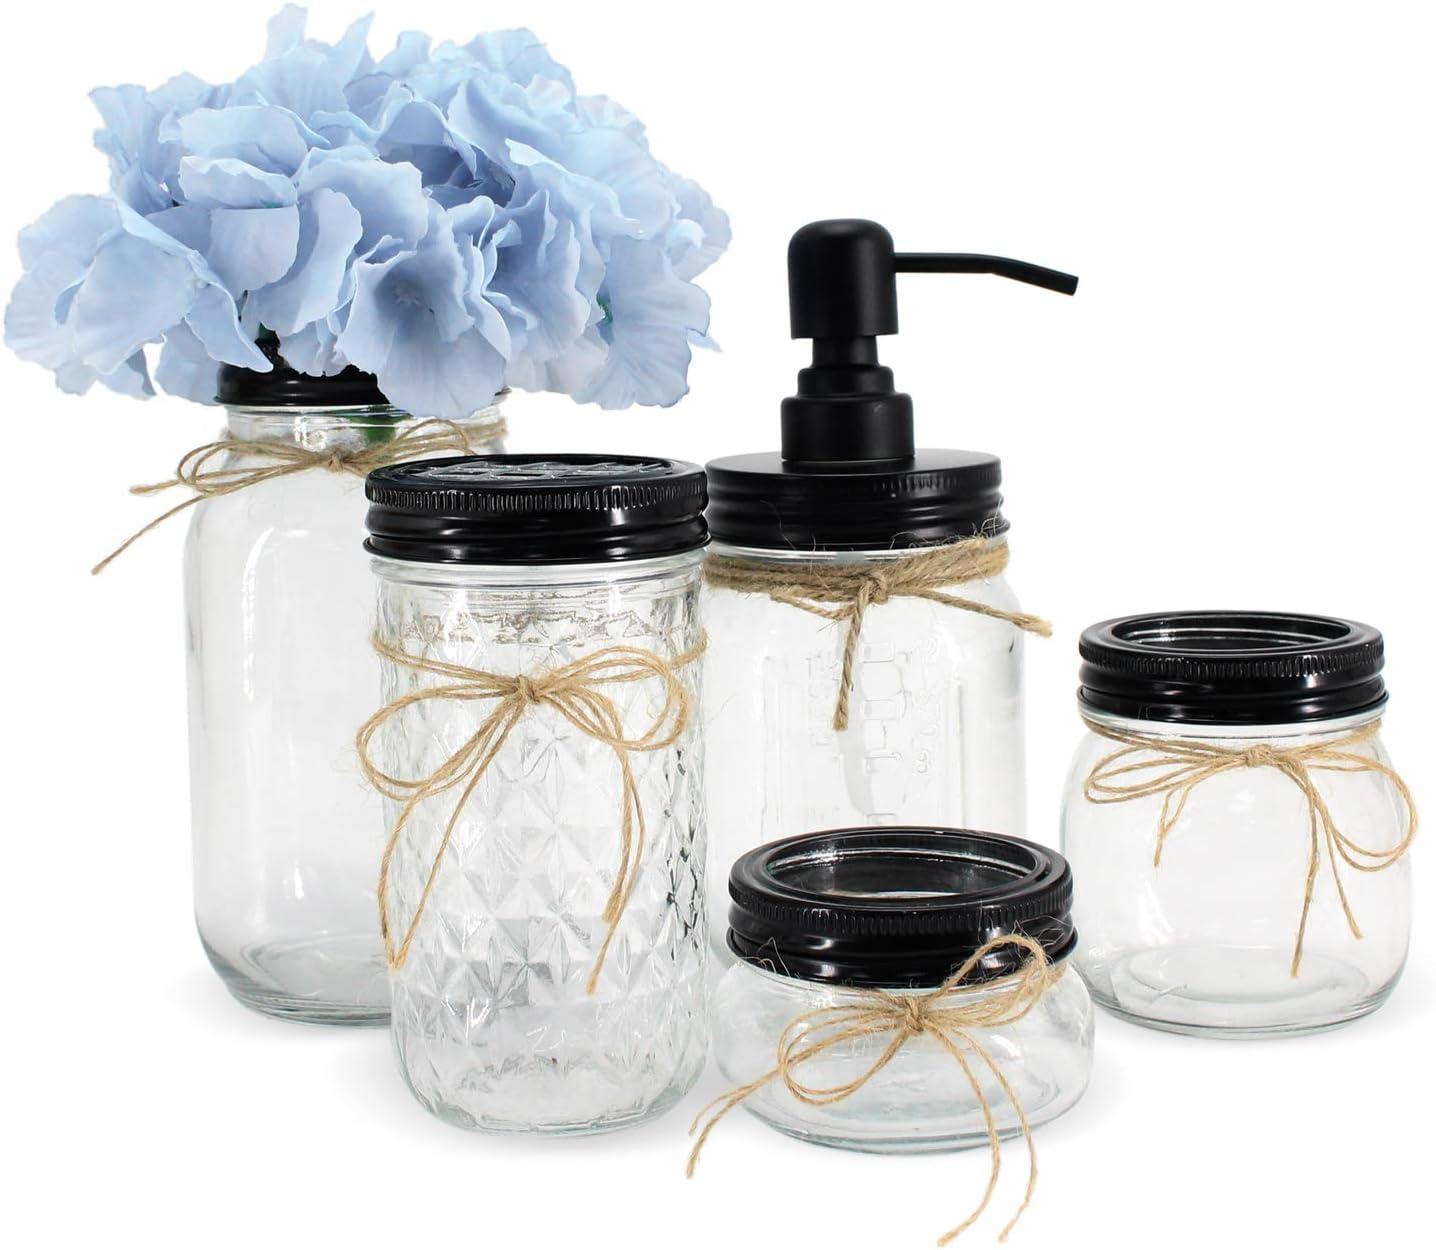 Unistyle Mason Jar Bathroom Accessories Set, MasonJars Bathroom Organizer, Countertop Vanity Organizer,Include Liquid Soap Dispenser, Cotton Swab,Tissue,Toothbrush Holder, Countertop Decor 5 Piece